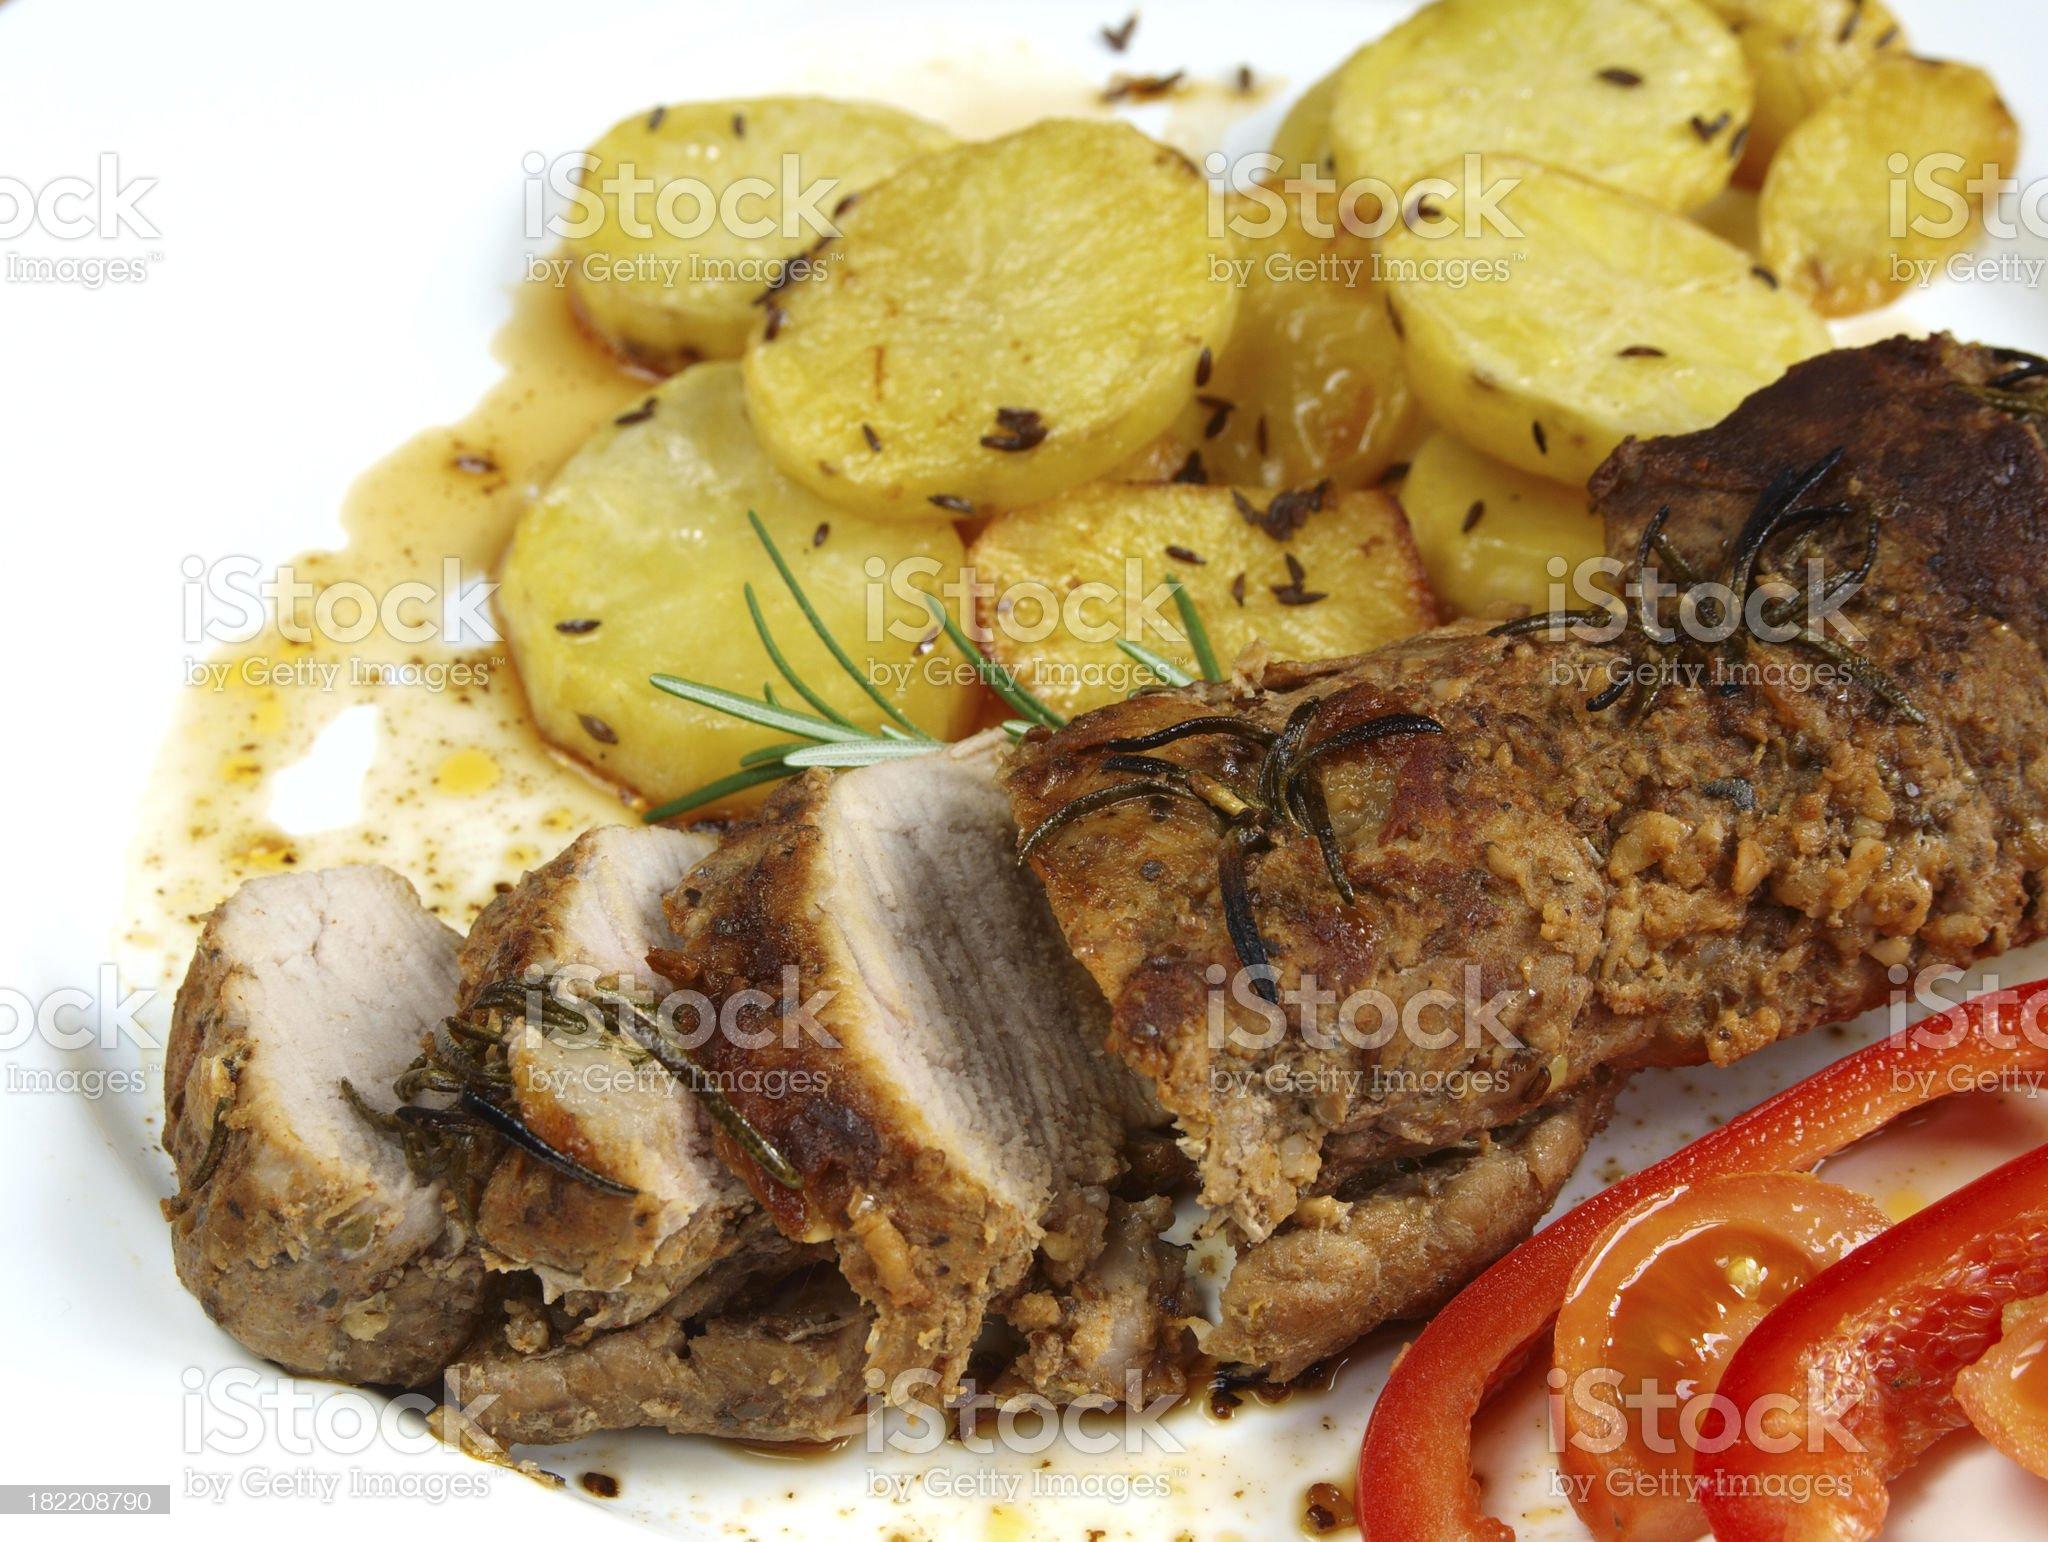 Roasted pork sirloin royalty-free stock photo